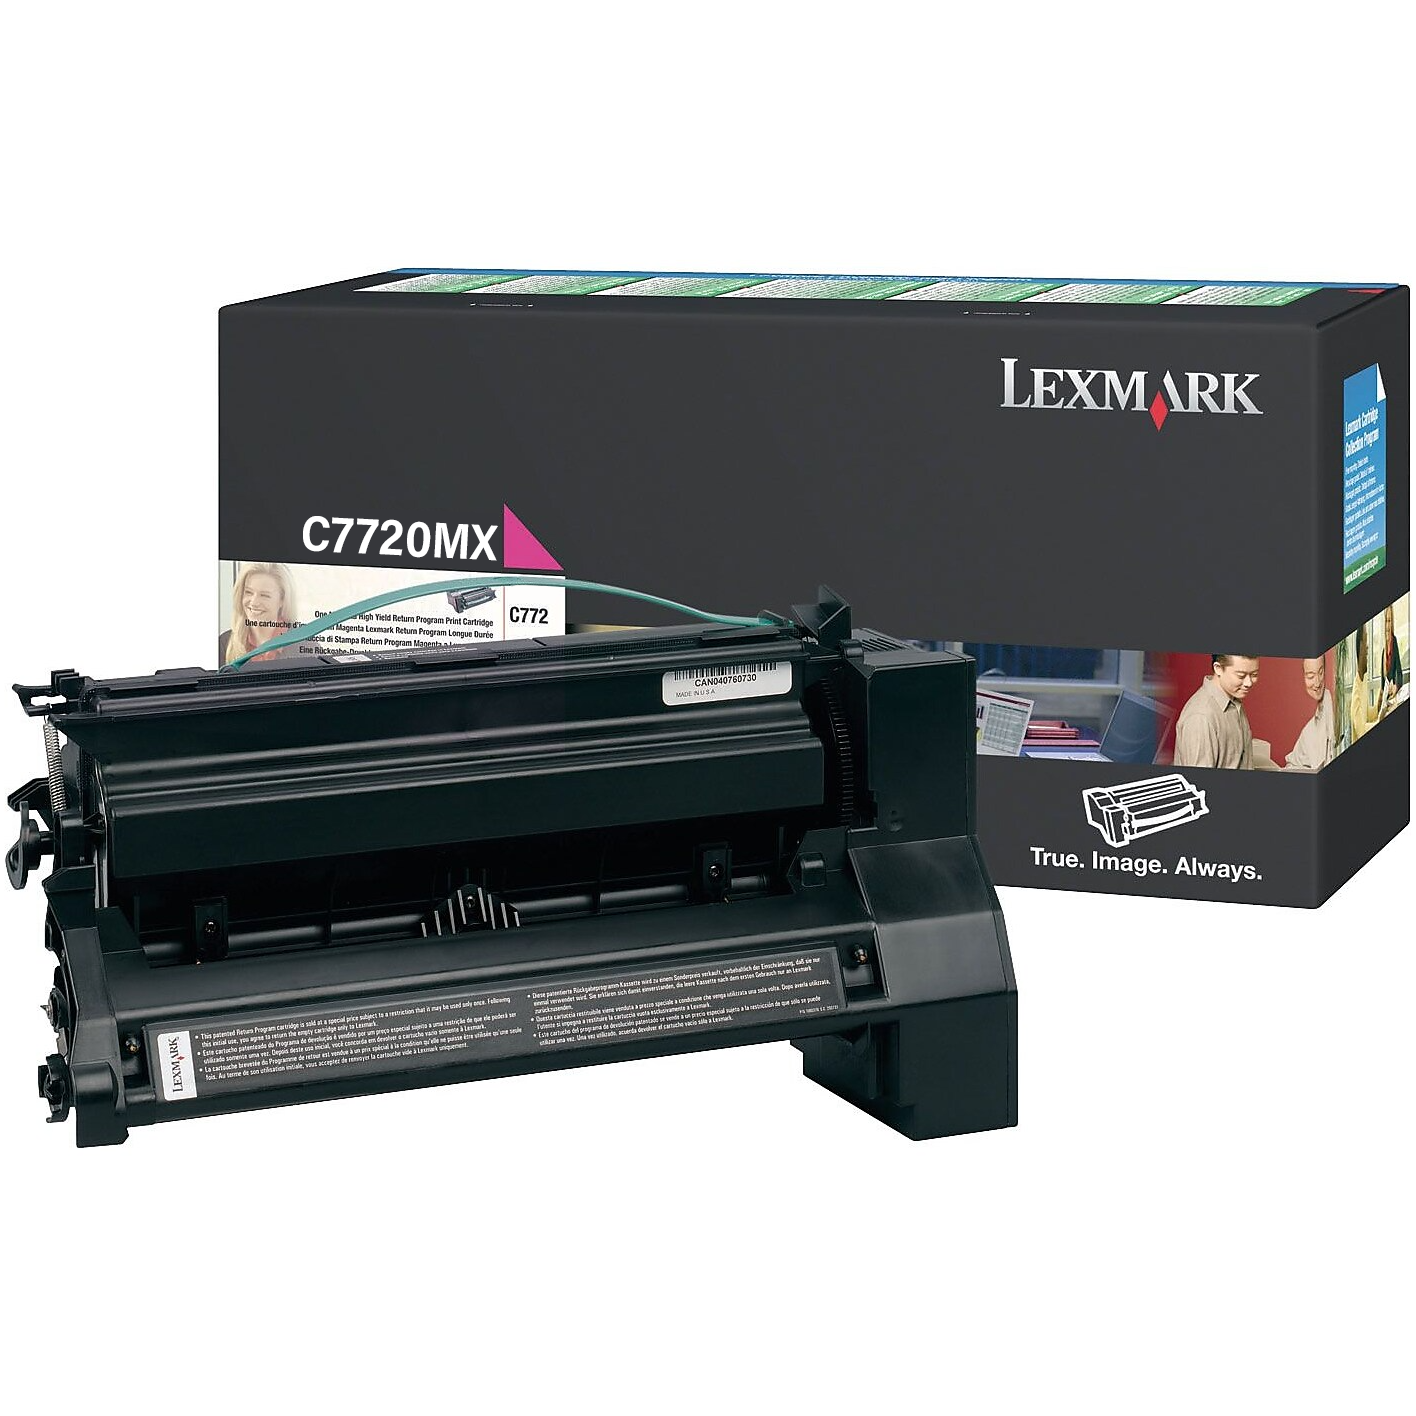 Original Lexmark C7720MX Magenta Extra High-Yield Toner Cartridge